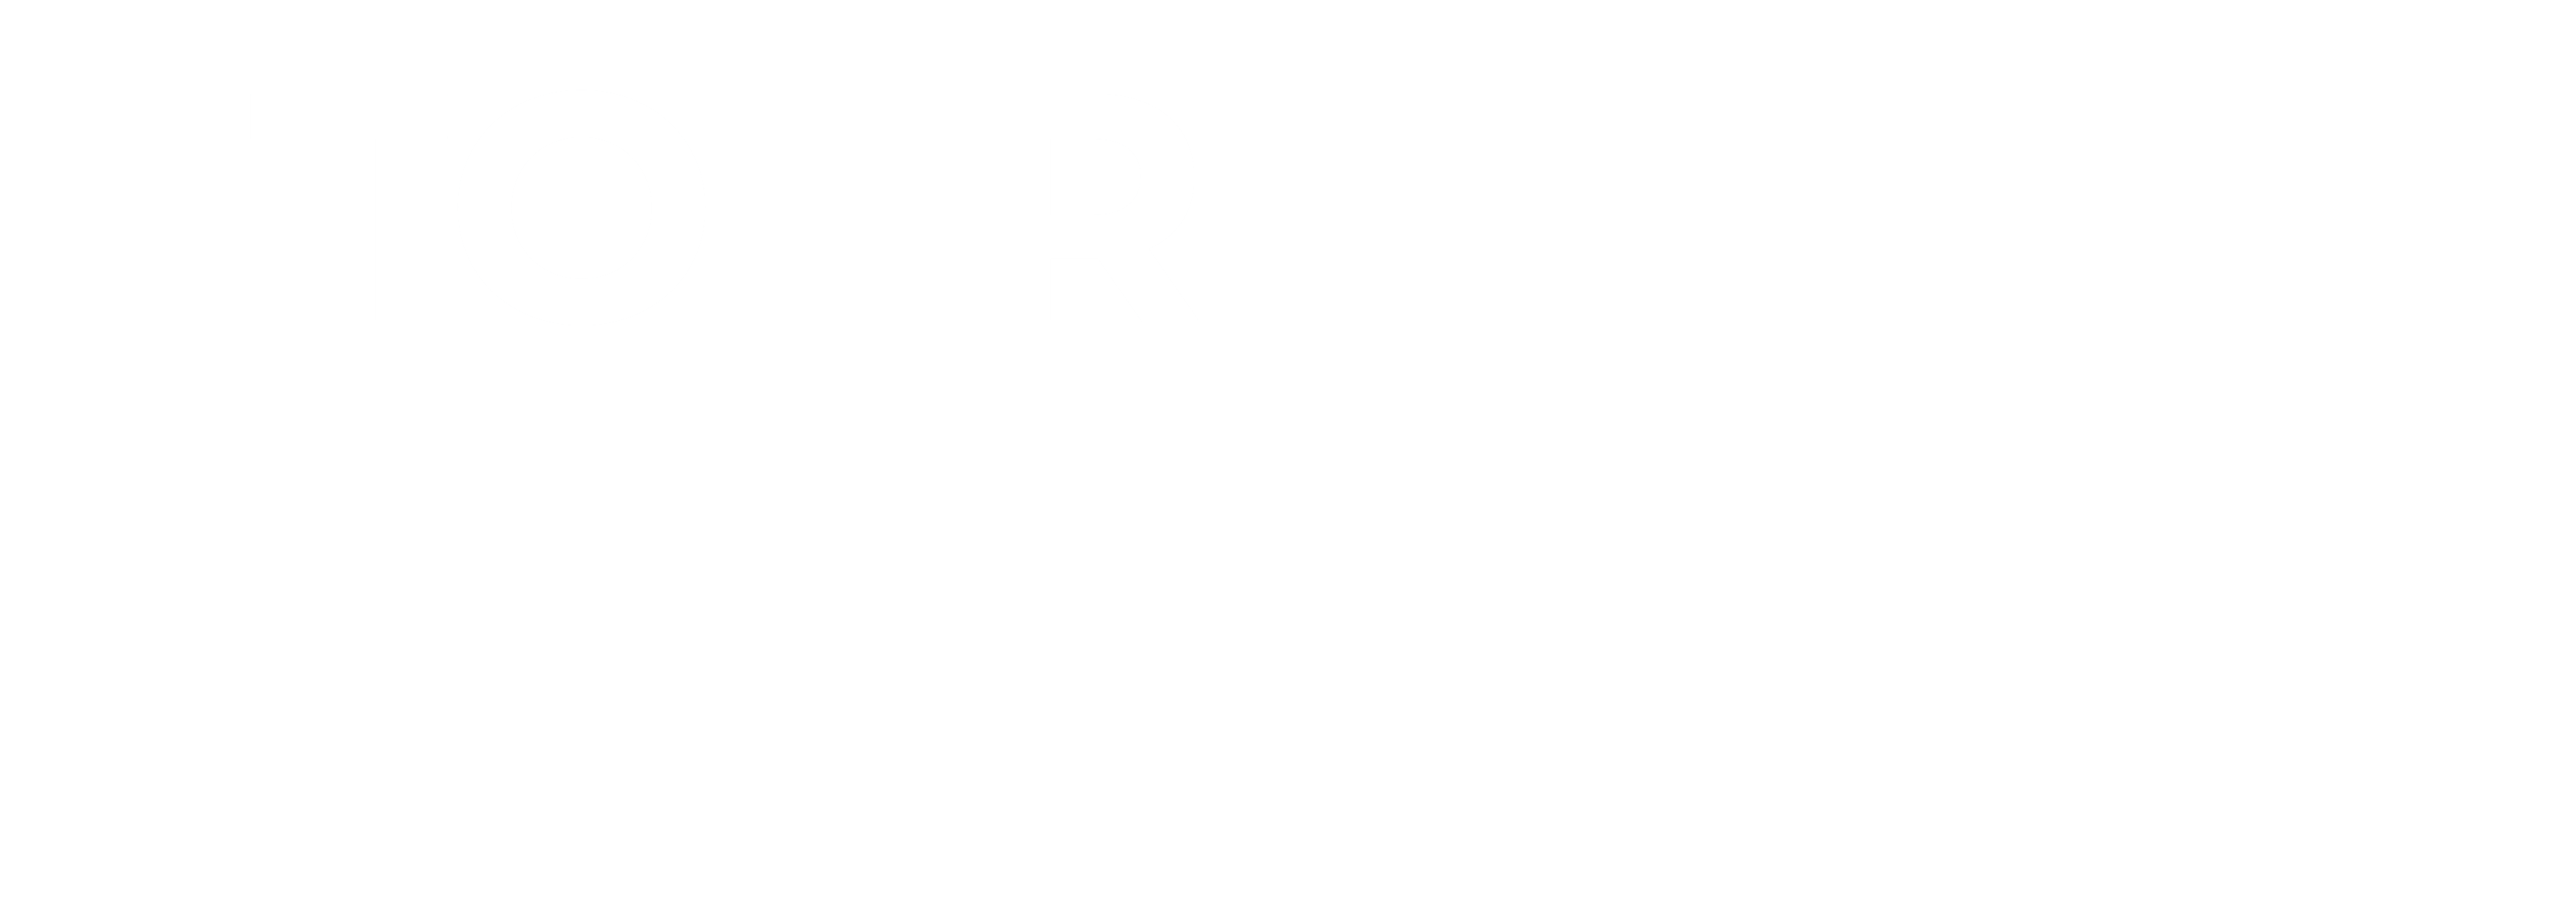 LOGO - TOURMALET - PIC DU MIDI - BLANC